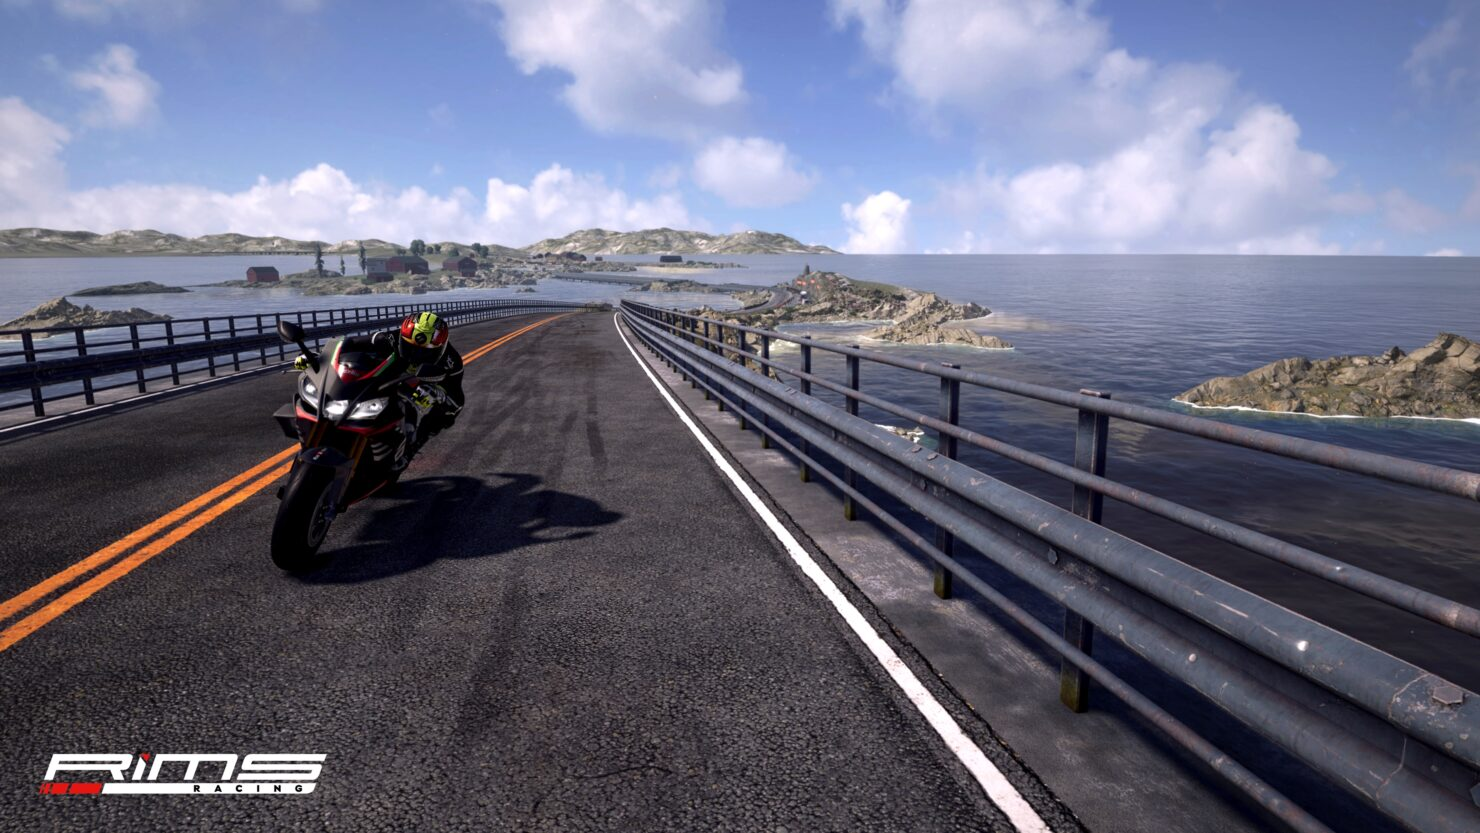 rims-racing-05-part-1